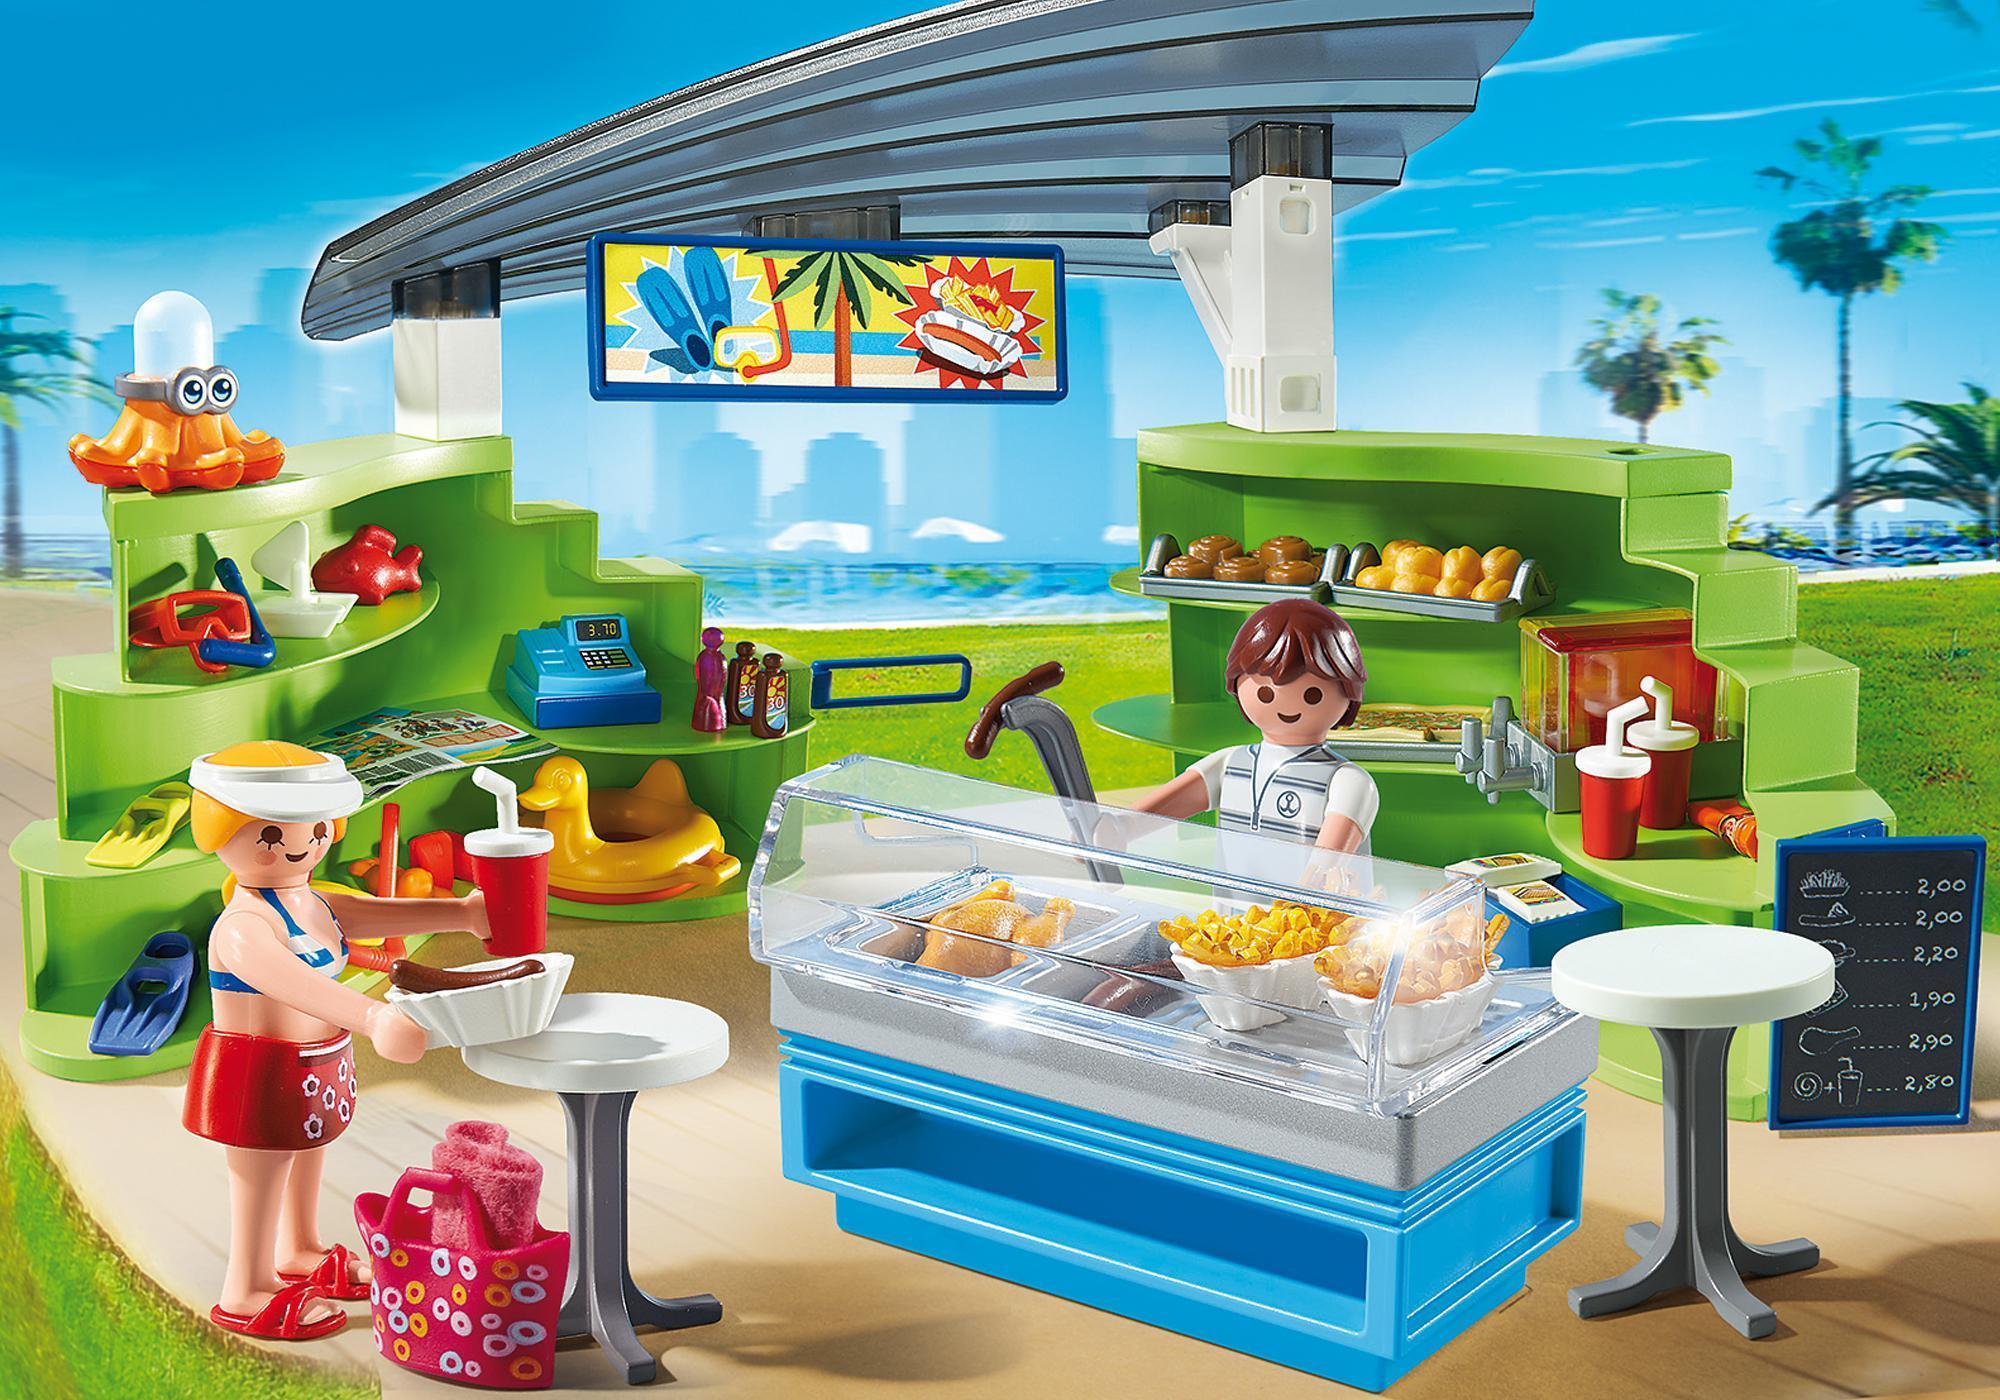 http://media.playmobil.com/i/playmobil/6672_product_detail/Ristorante fast food